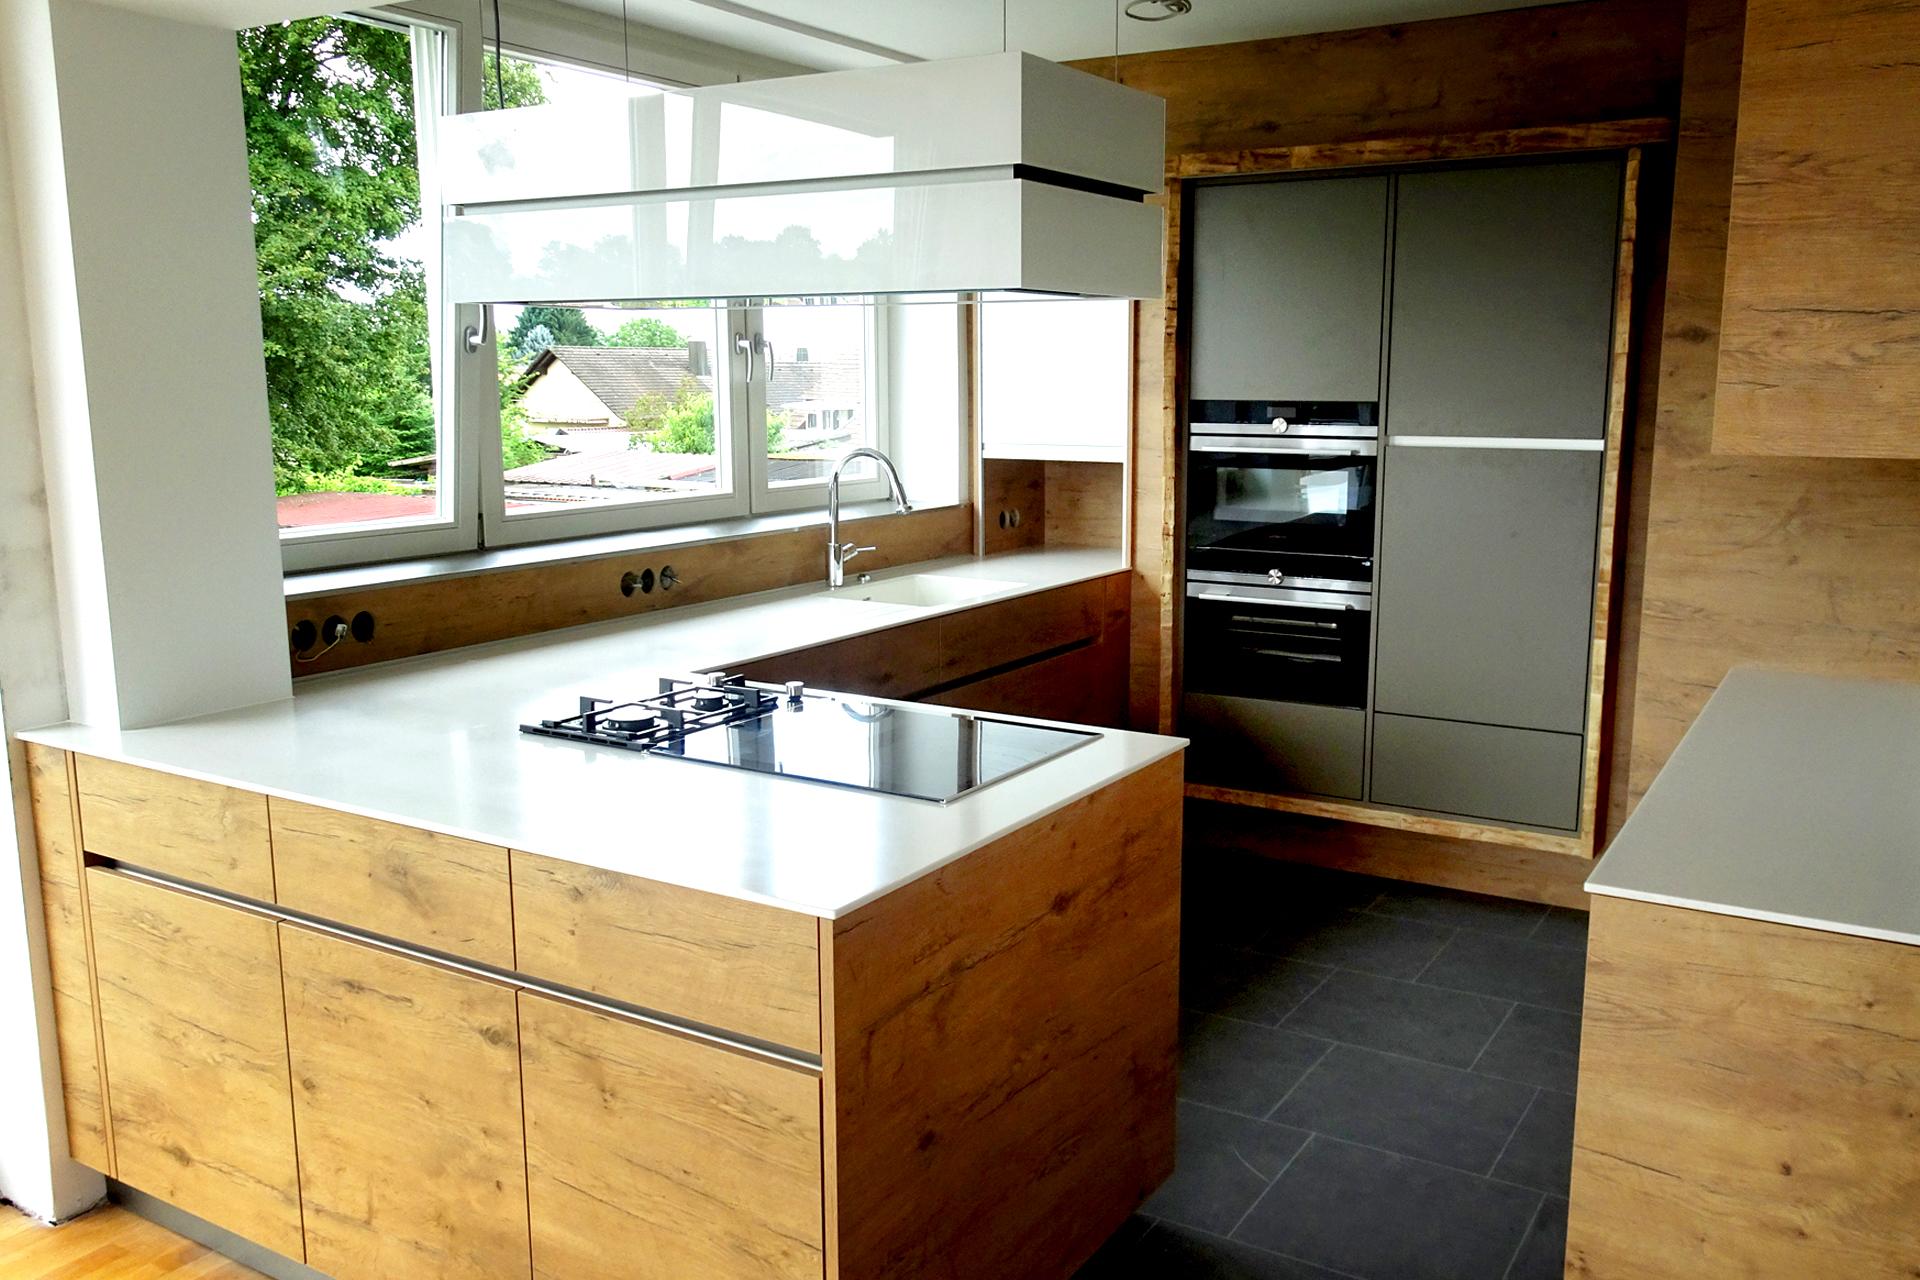 moebel de kchen speed alpinwei with moebel de kchen zu. Black Bedroom Furniture Sets. Home Design Ideas